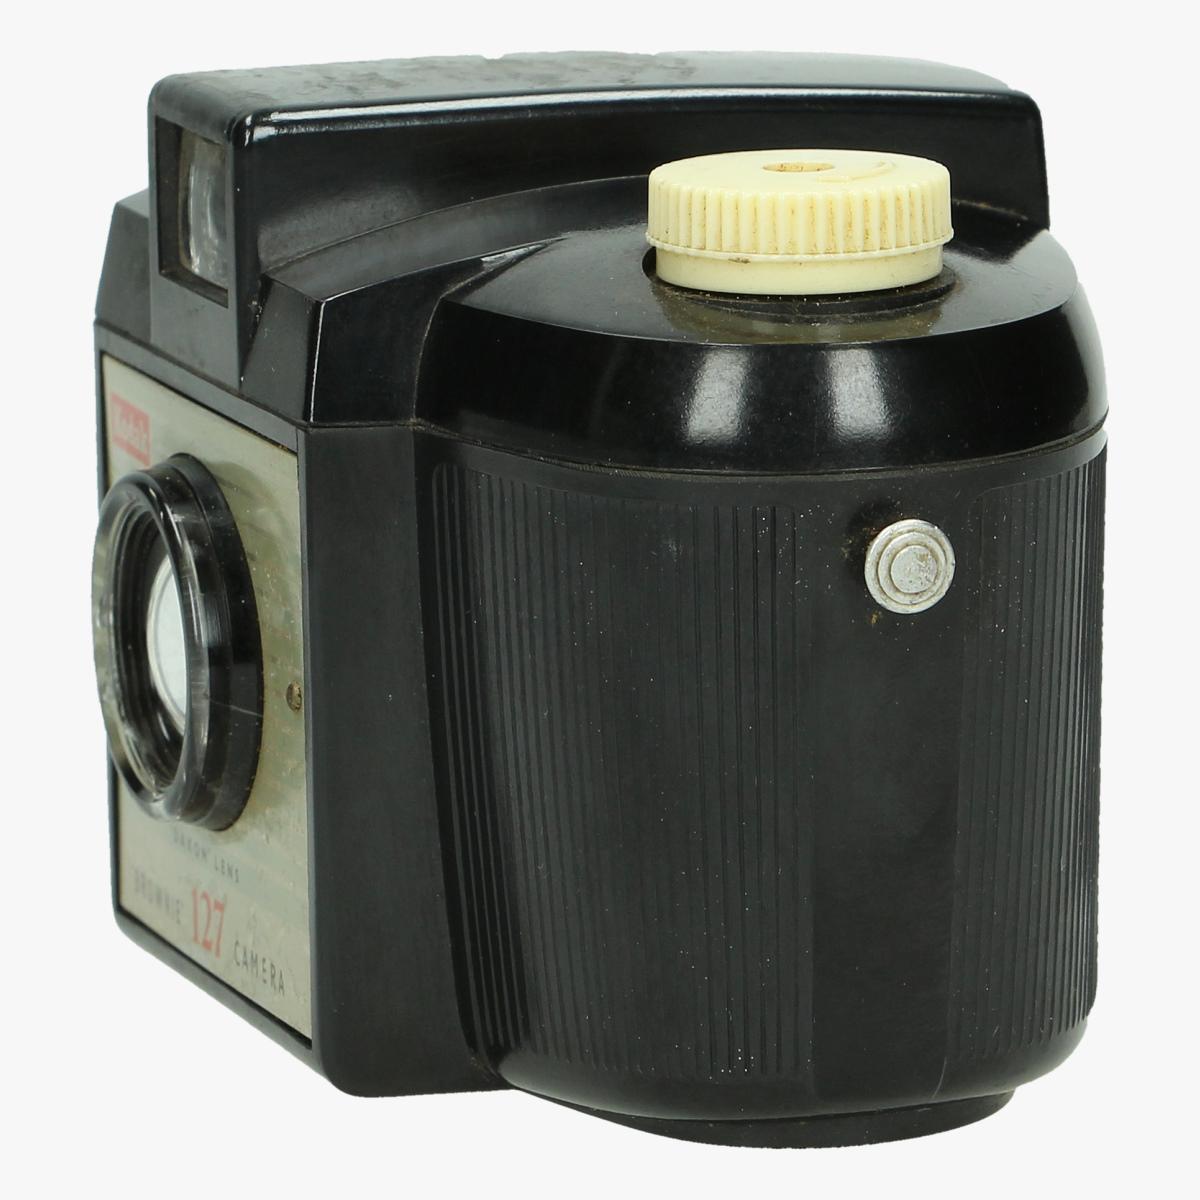 Afbeeldingen van fotocamera brownie 127 dakom lens